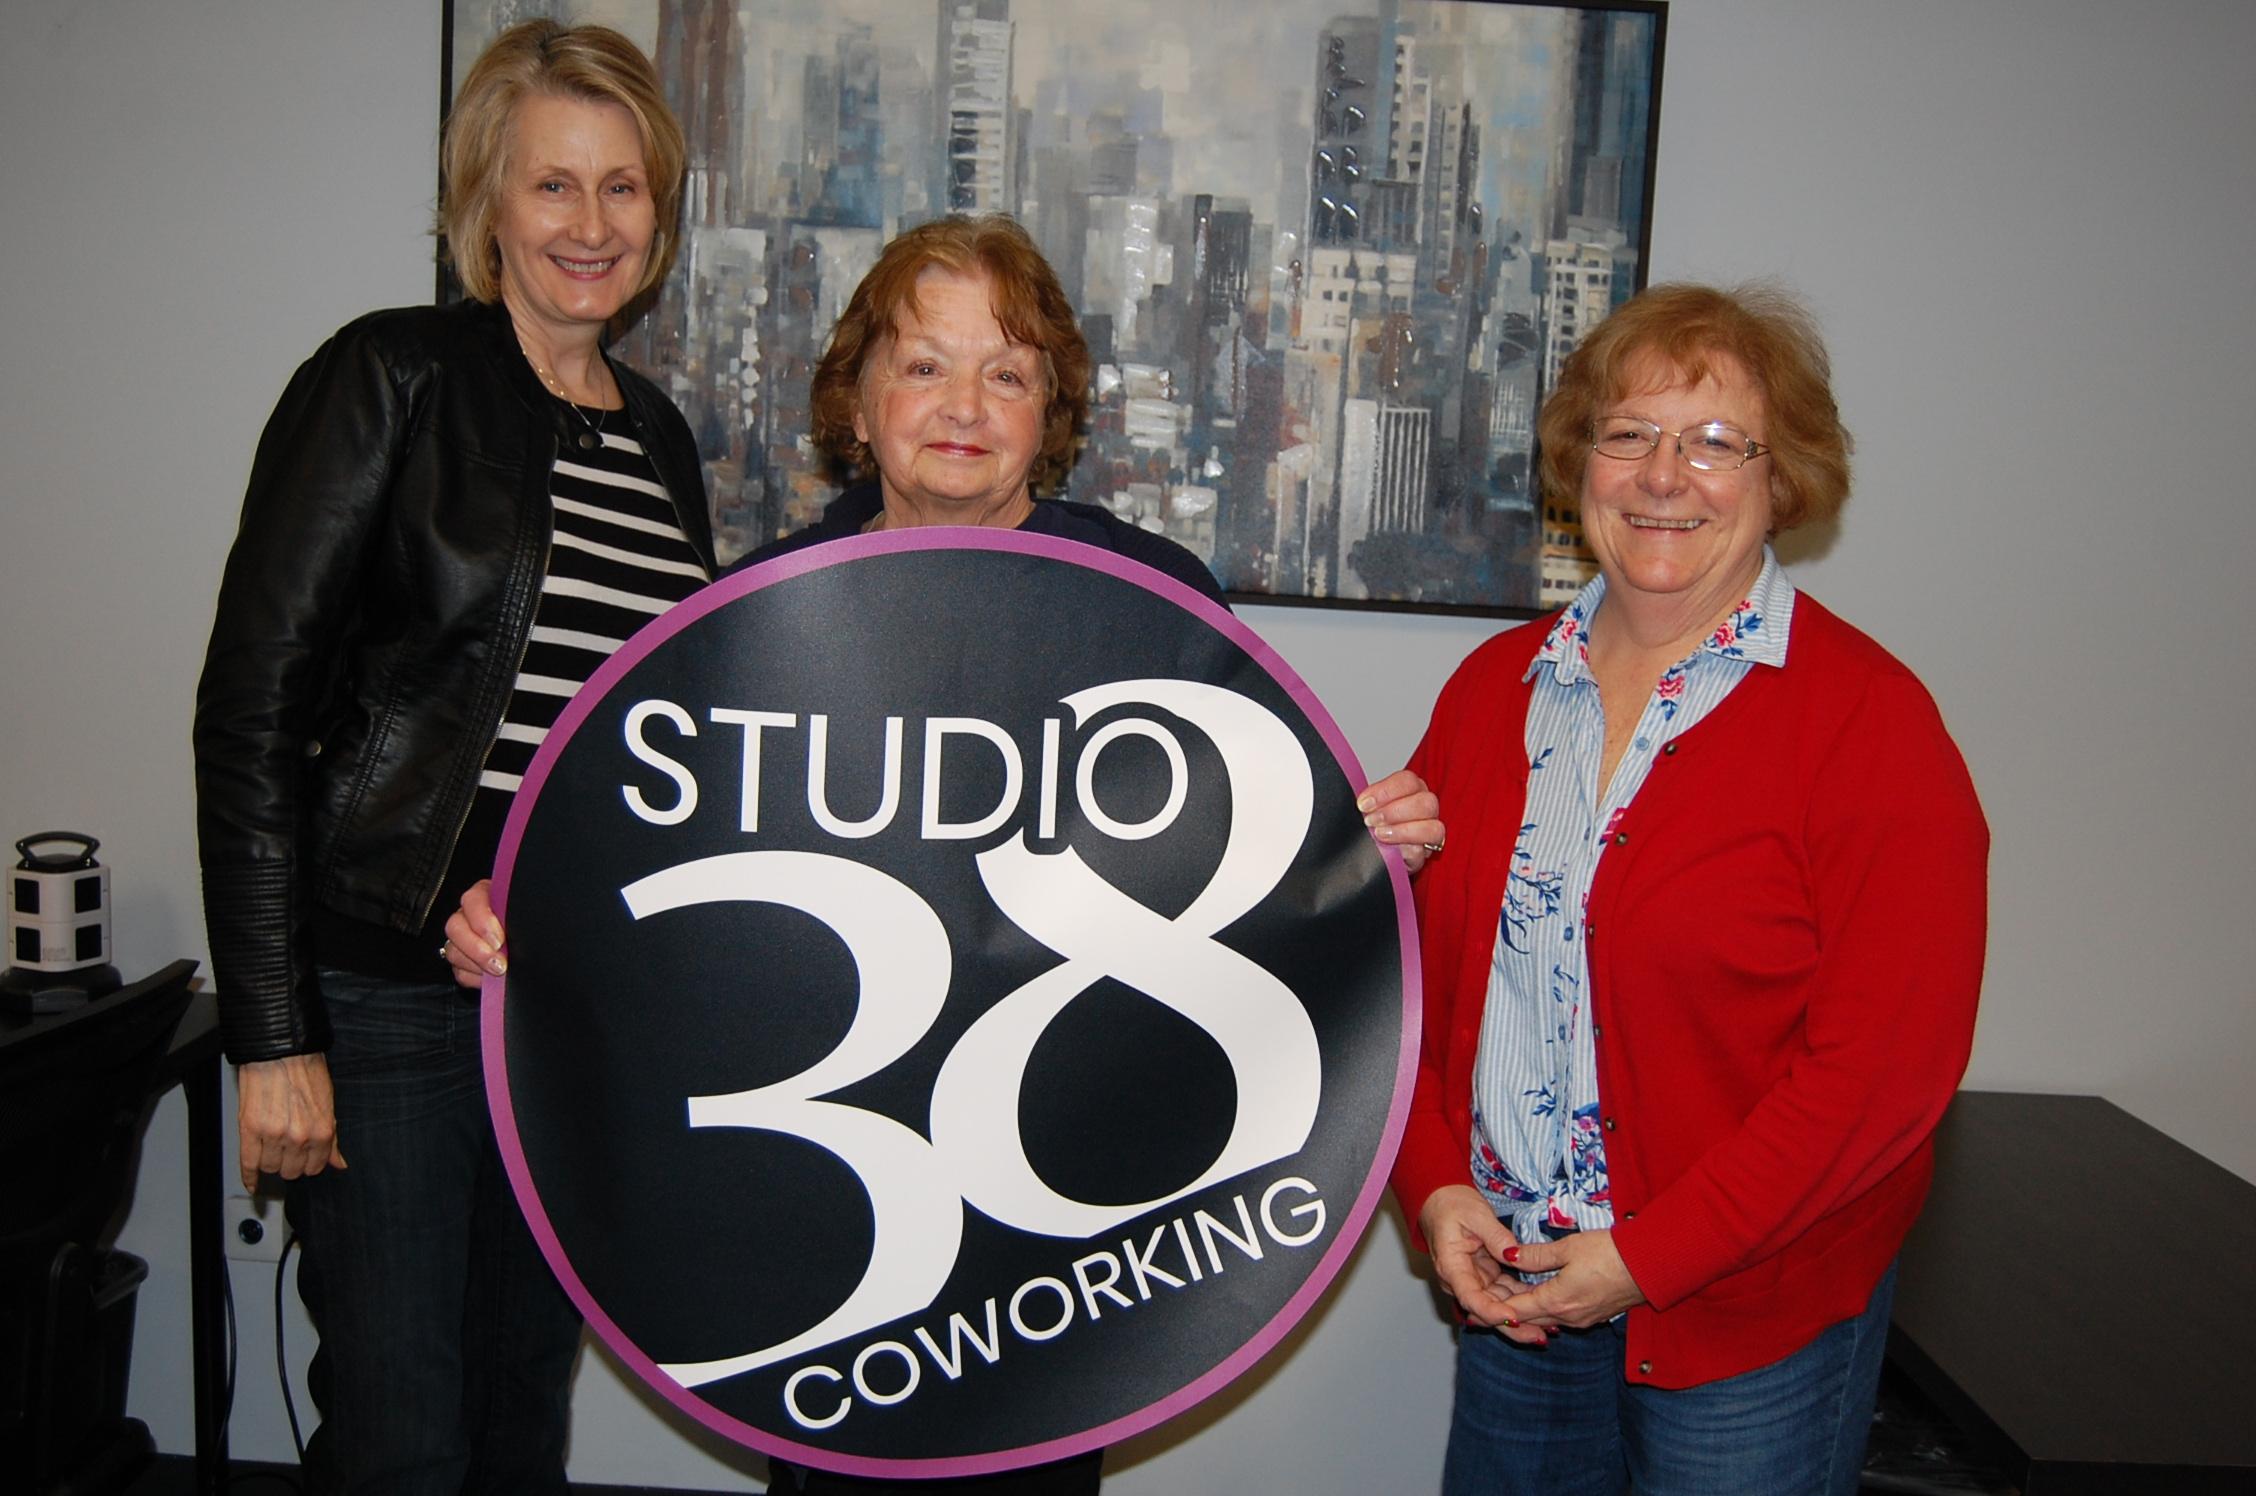 Studio 38 Coworking, Chicago